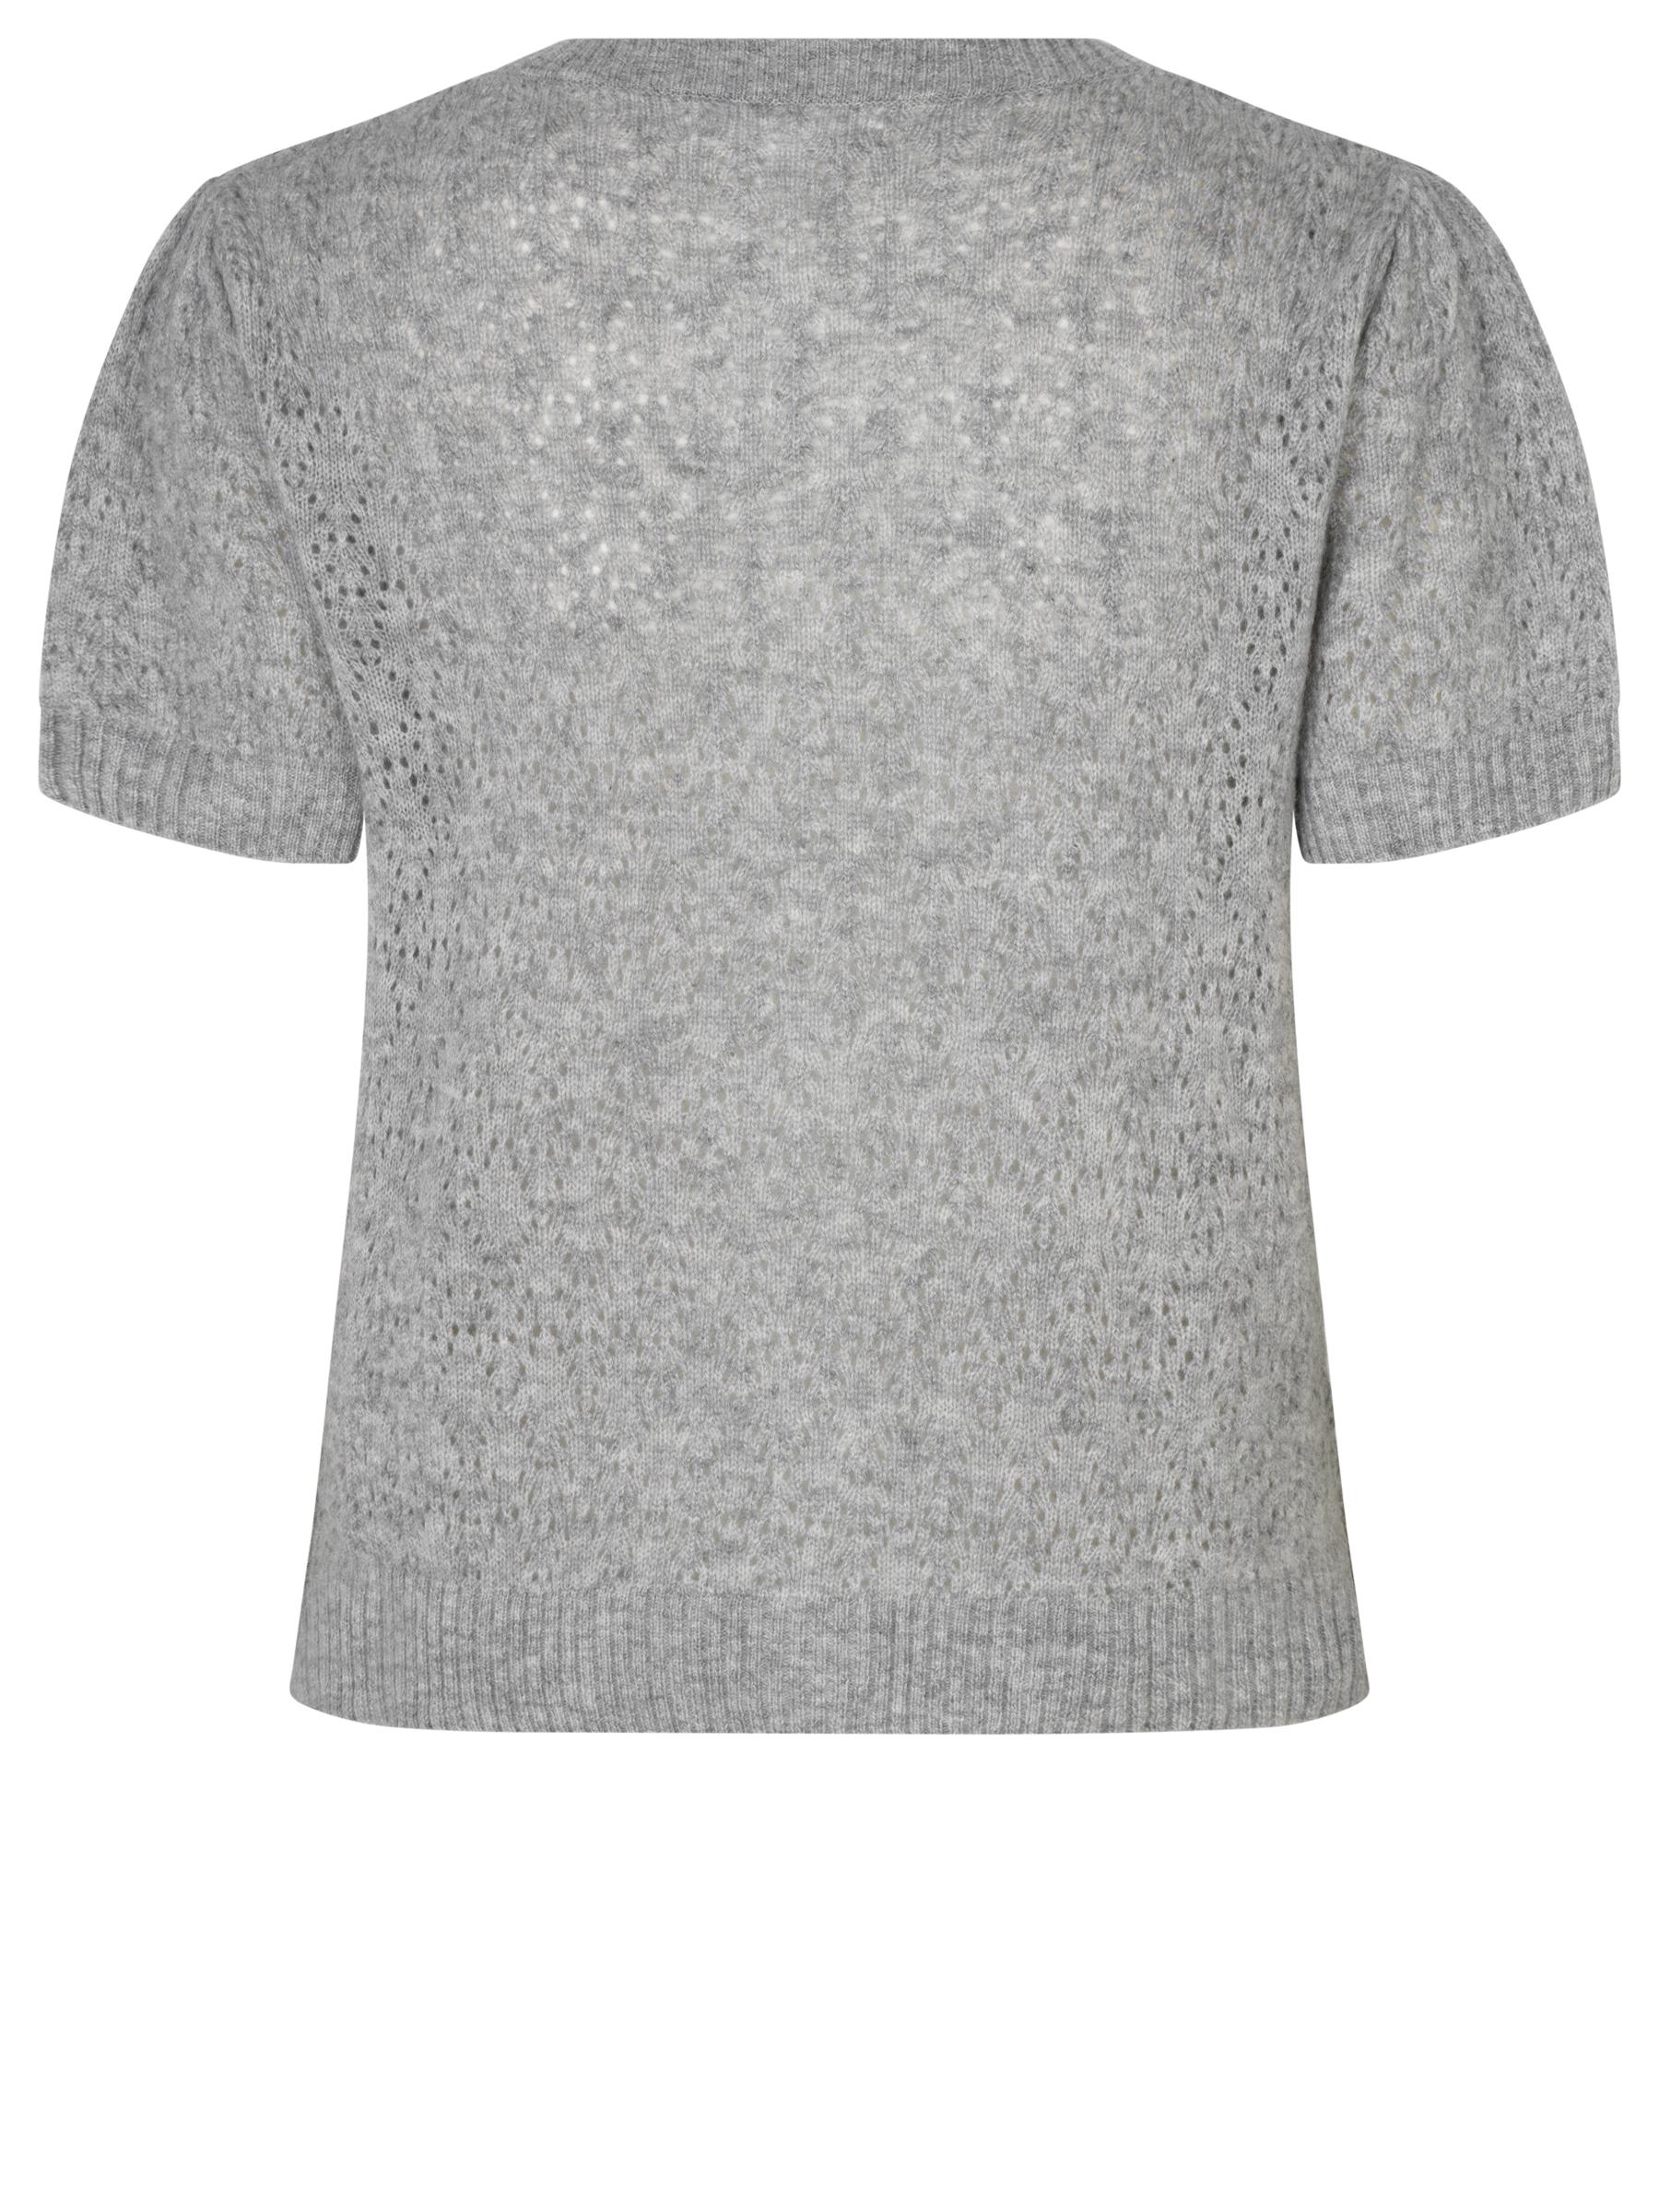 Rosmunde 6944 cardigan, Grey, Medium